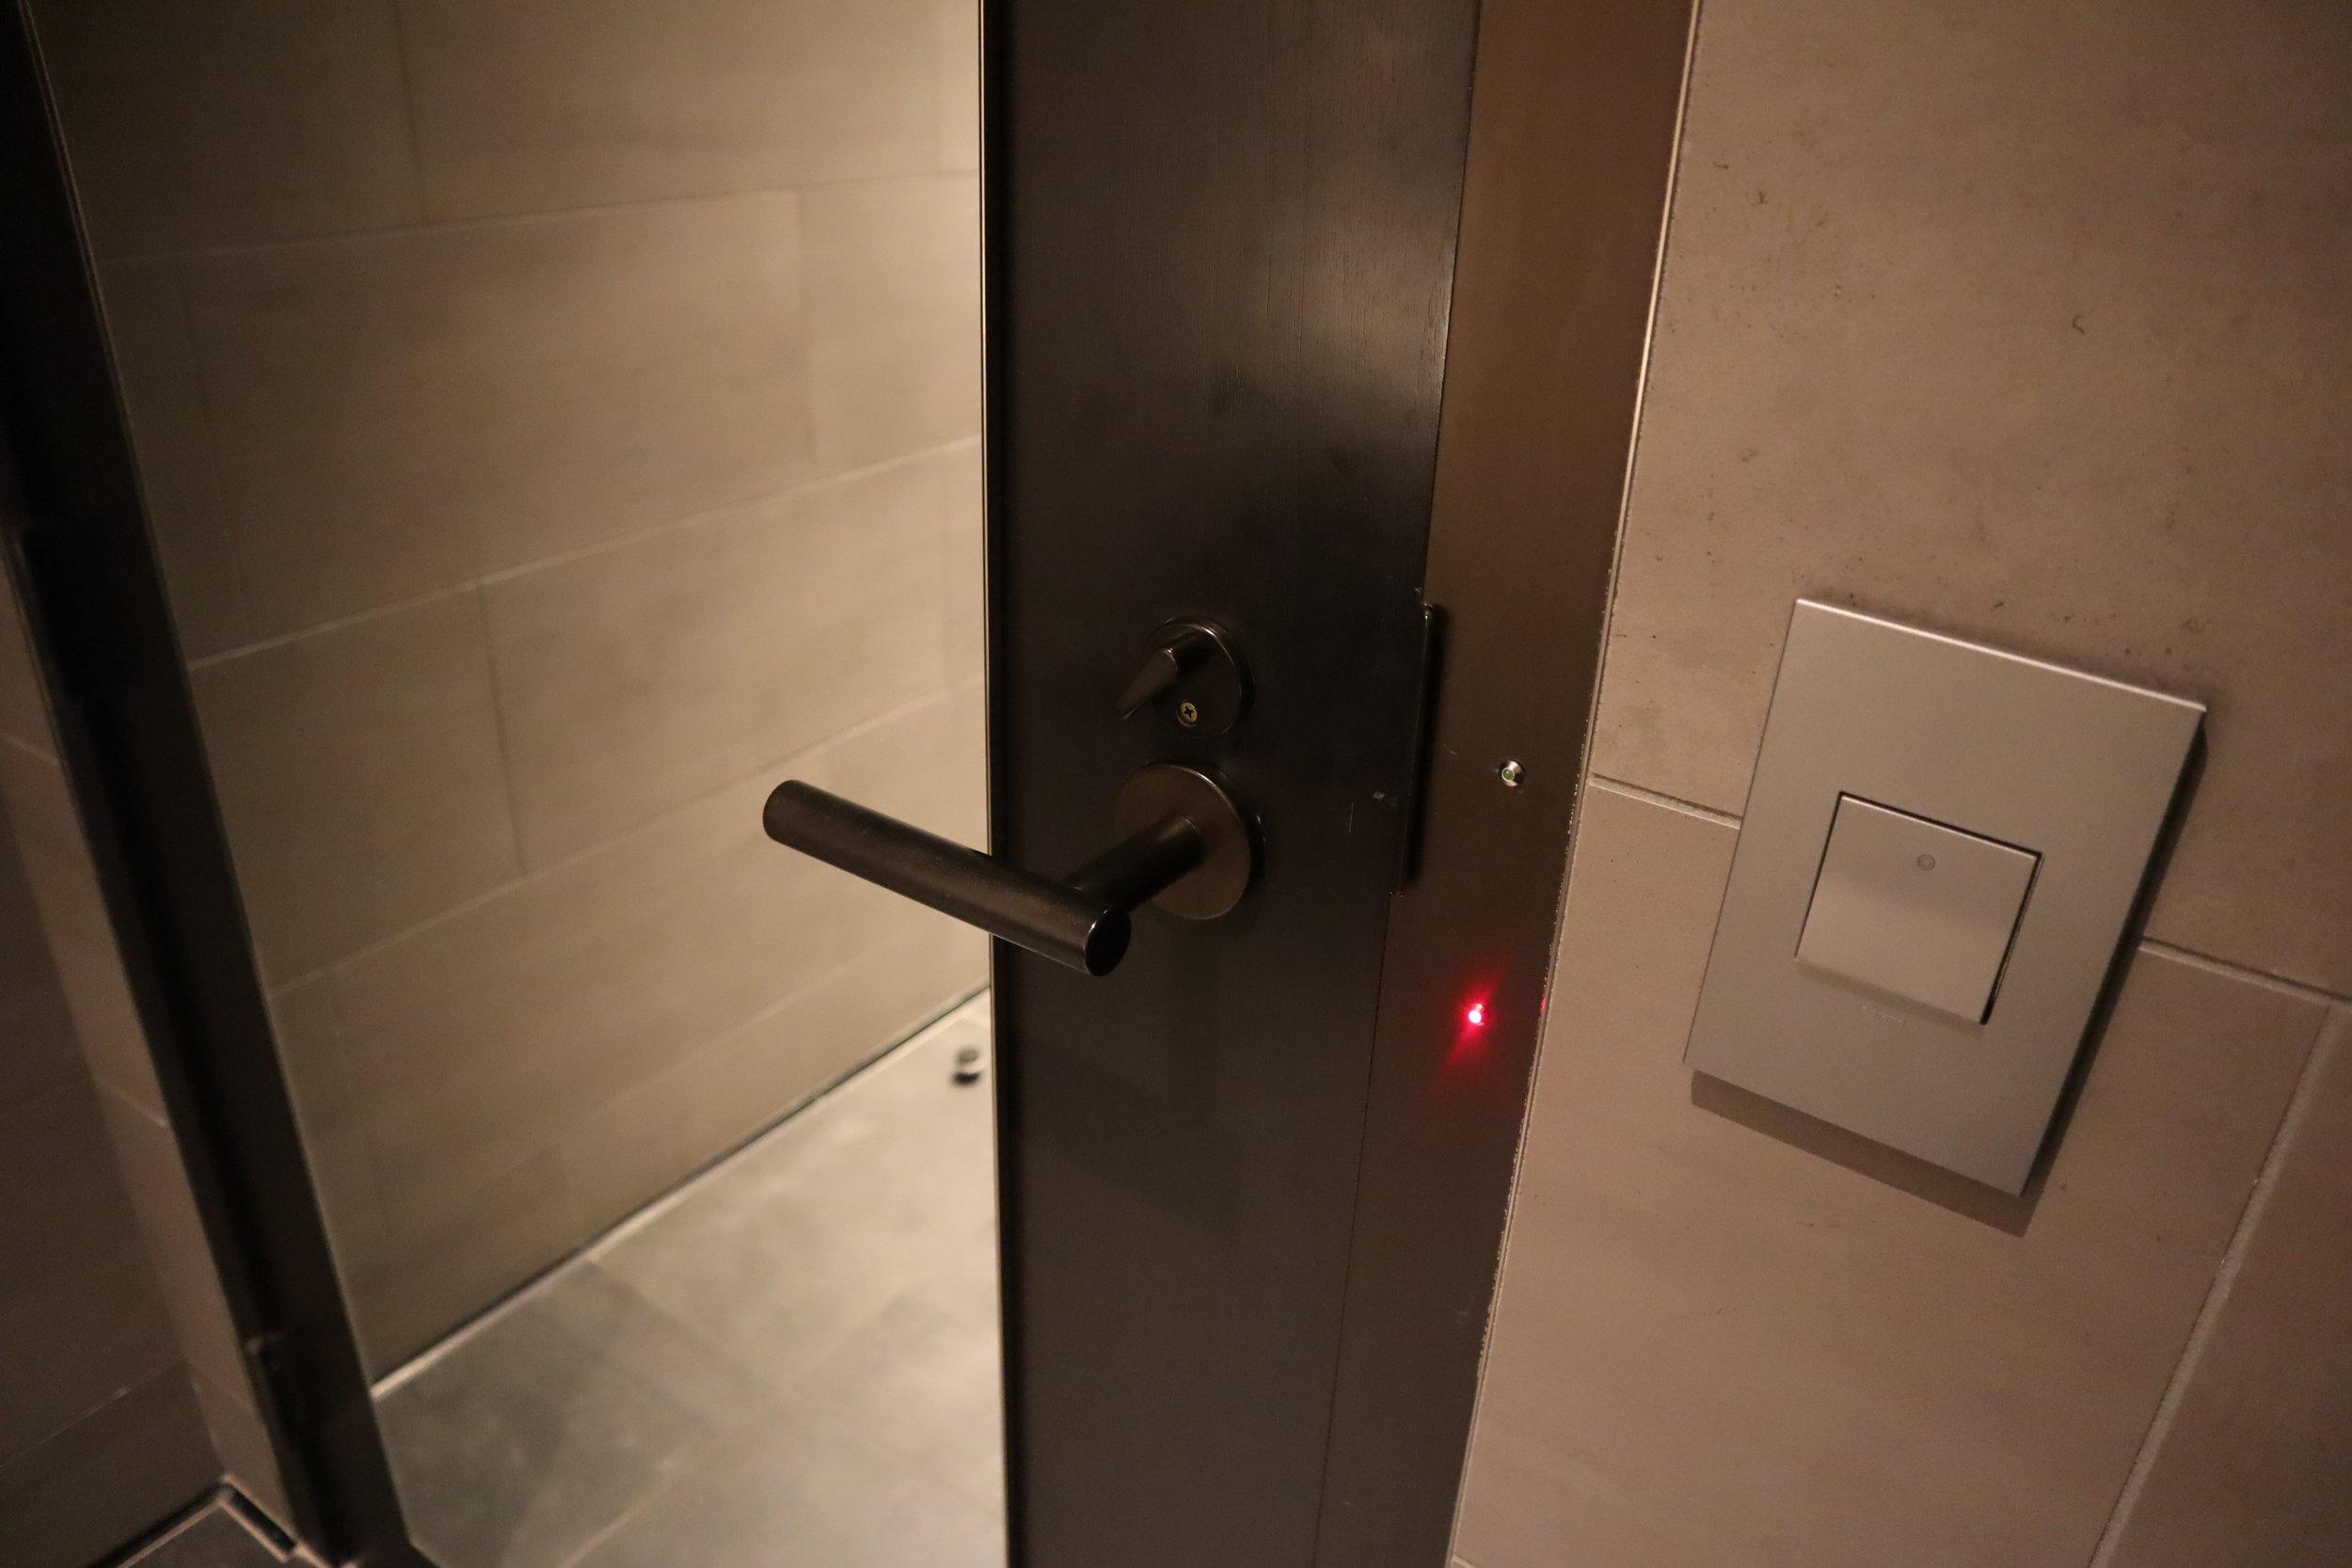 United Polaris Lounge Newark – Bathroom door light